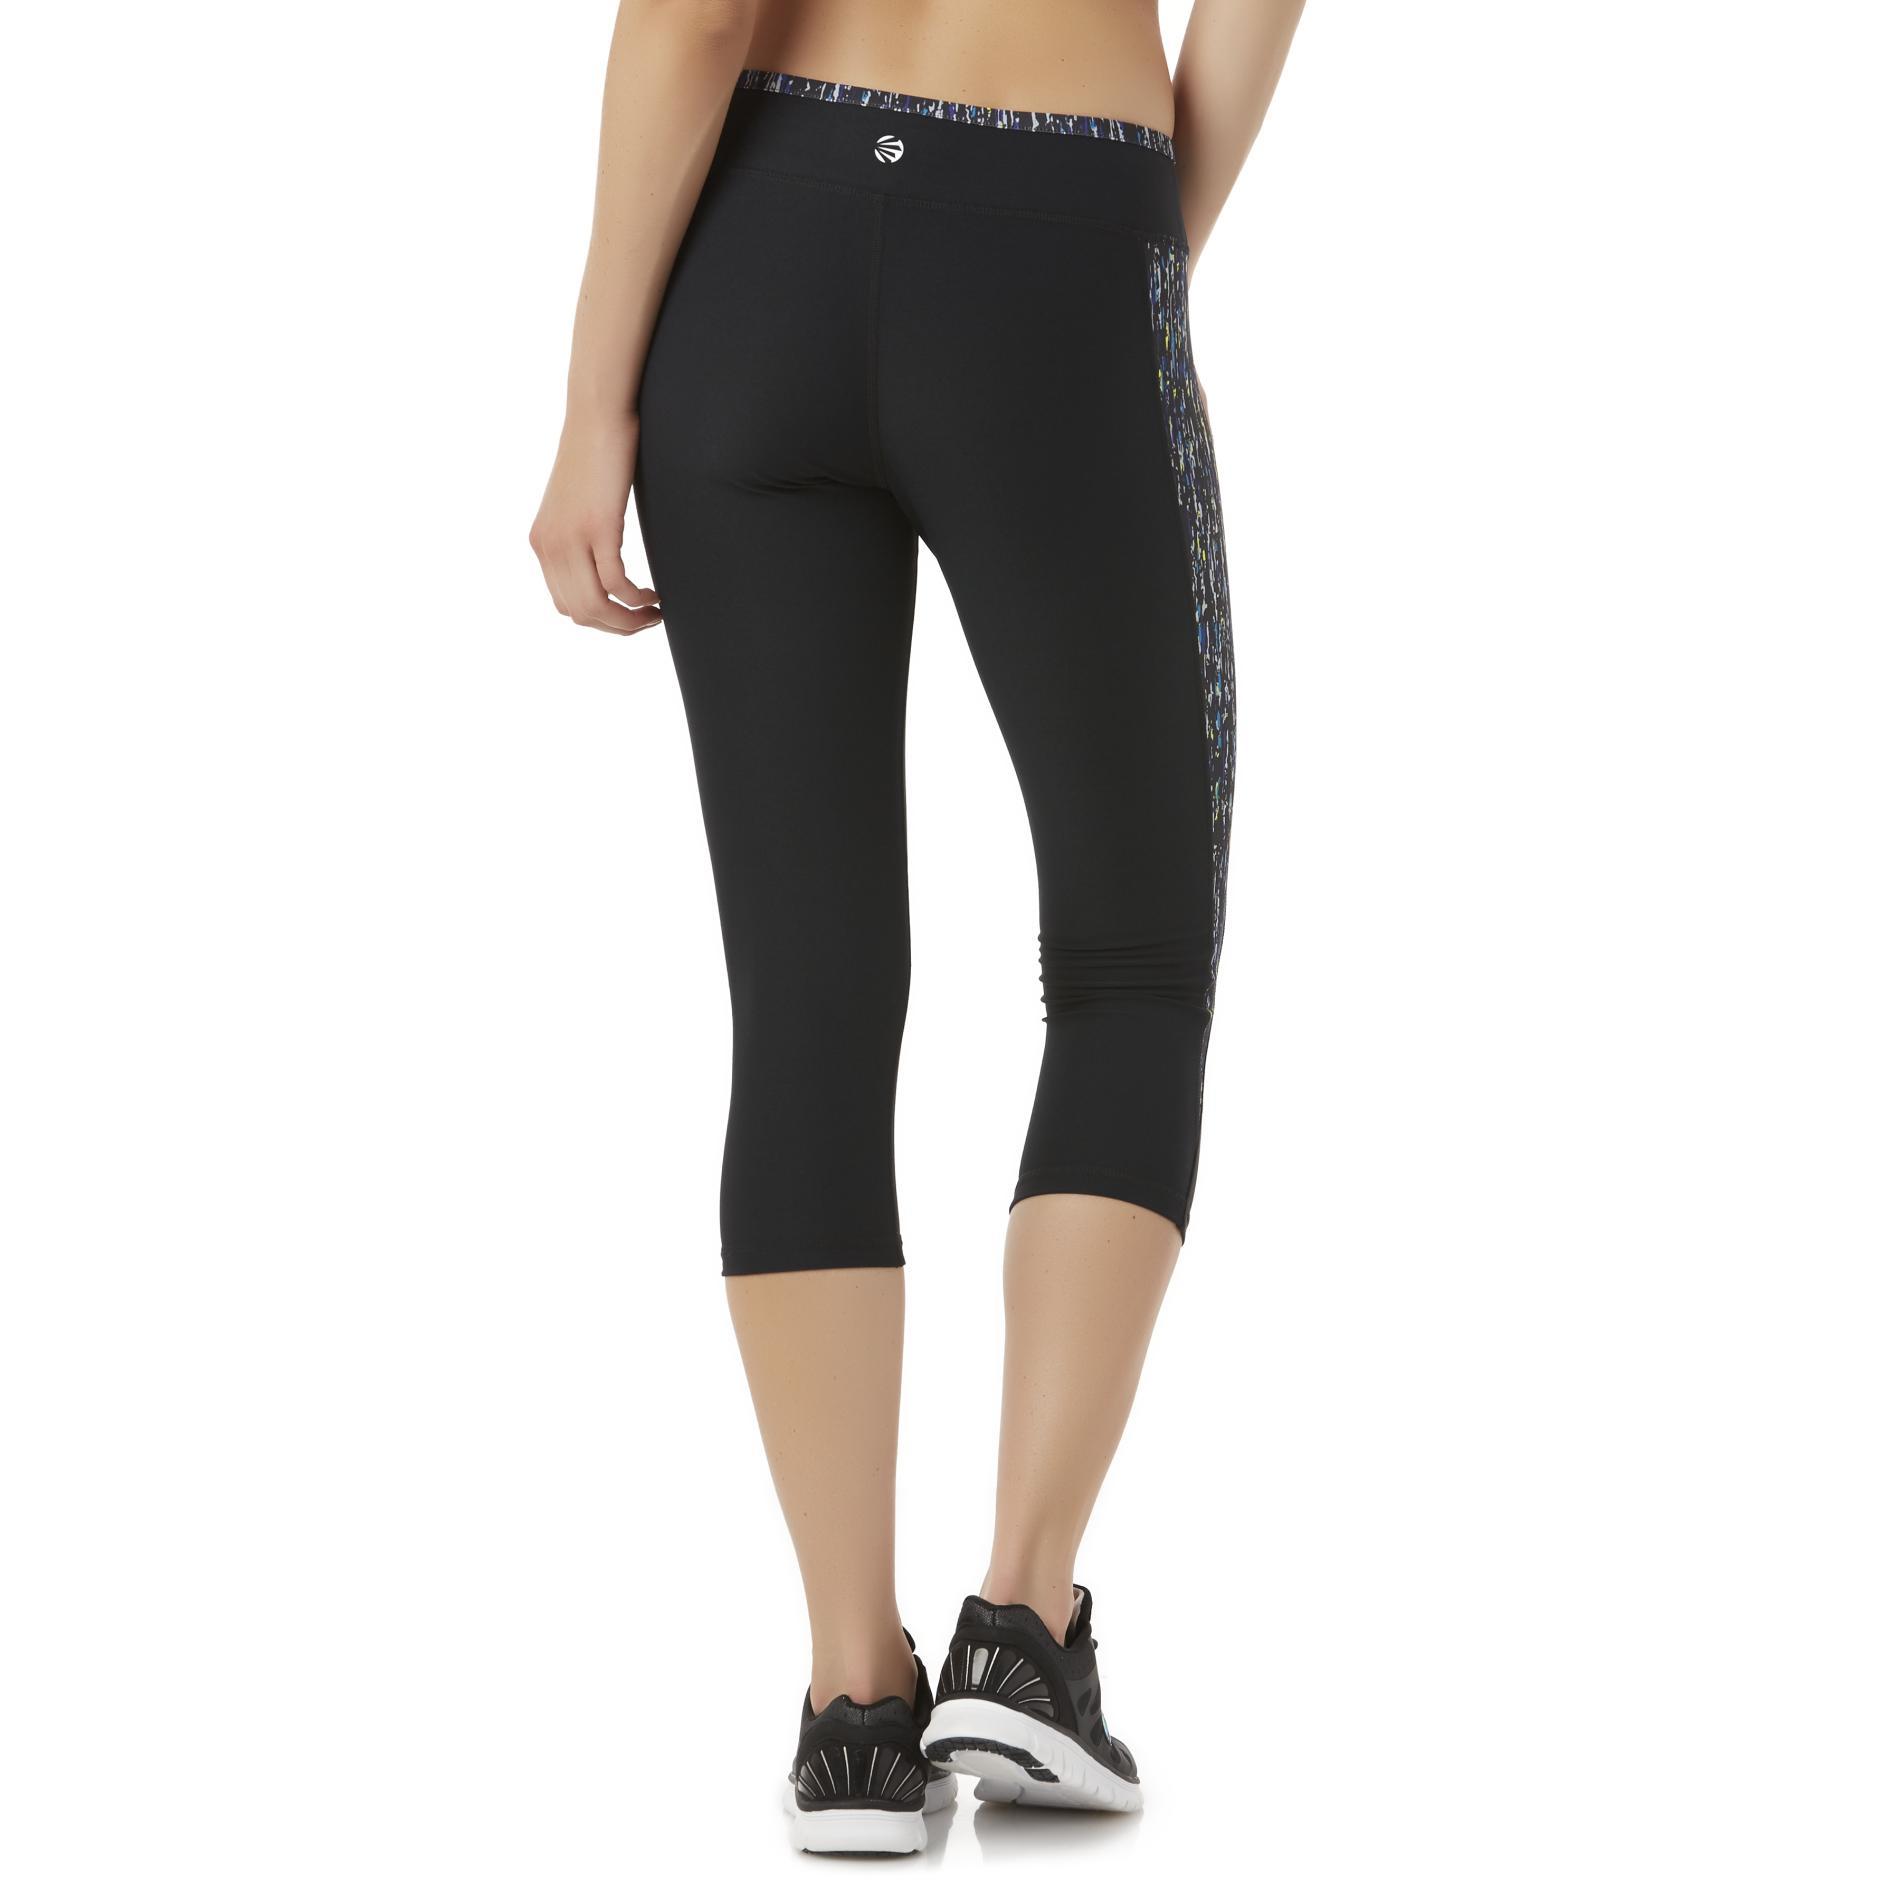 Impact by Jillian Michaels Women's Athletic Capri Leggings - Abstract